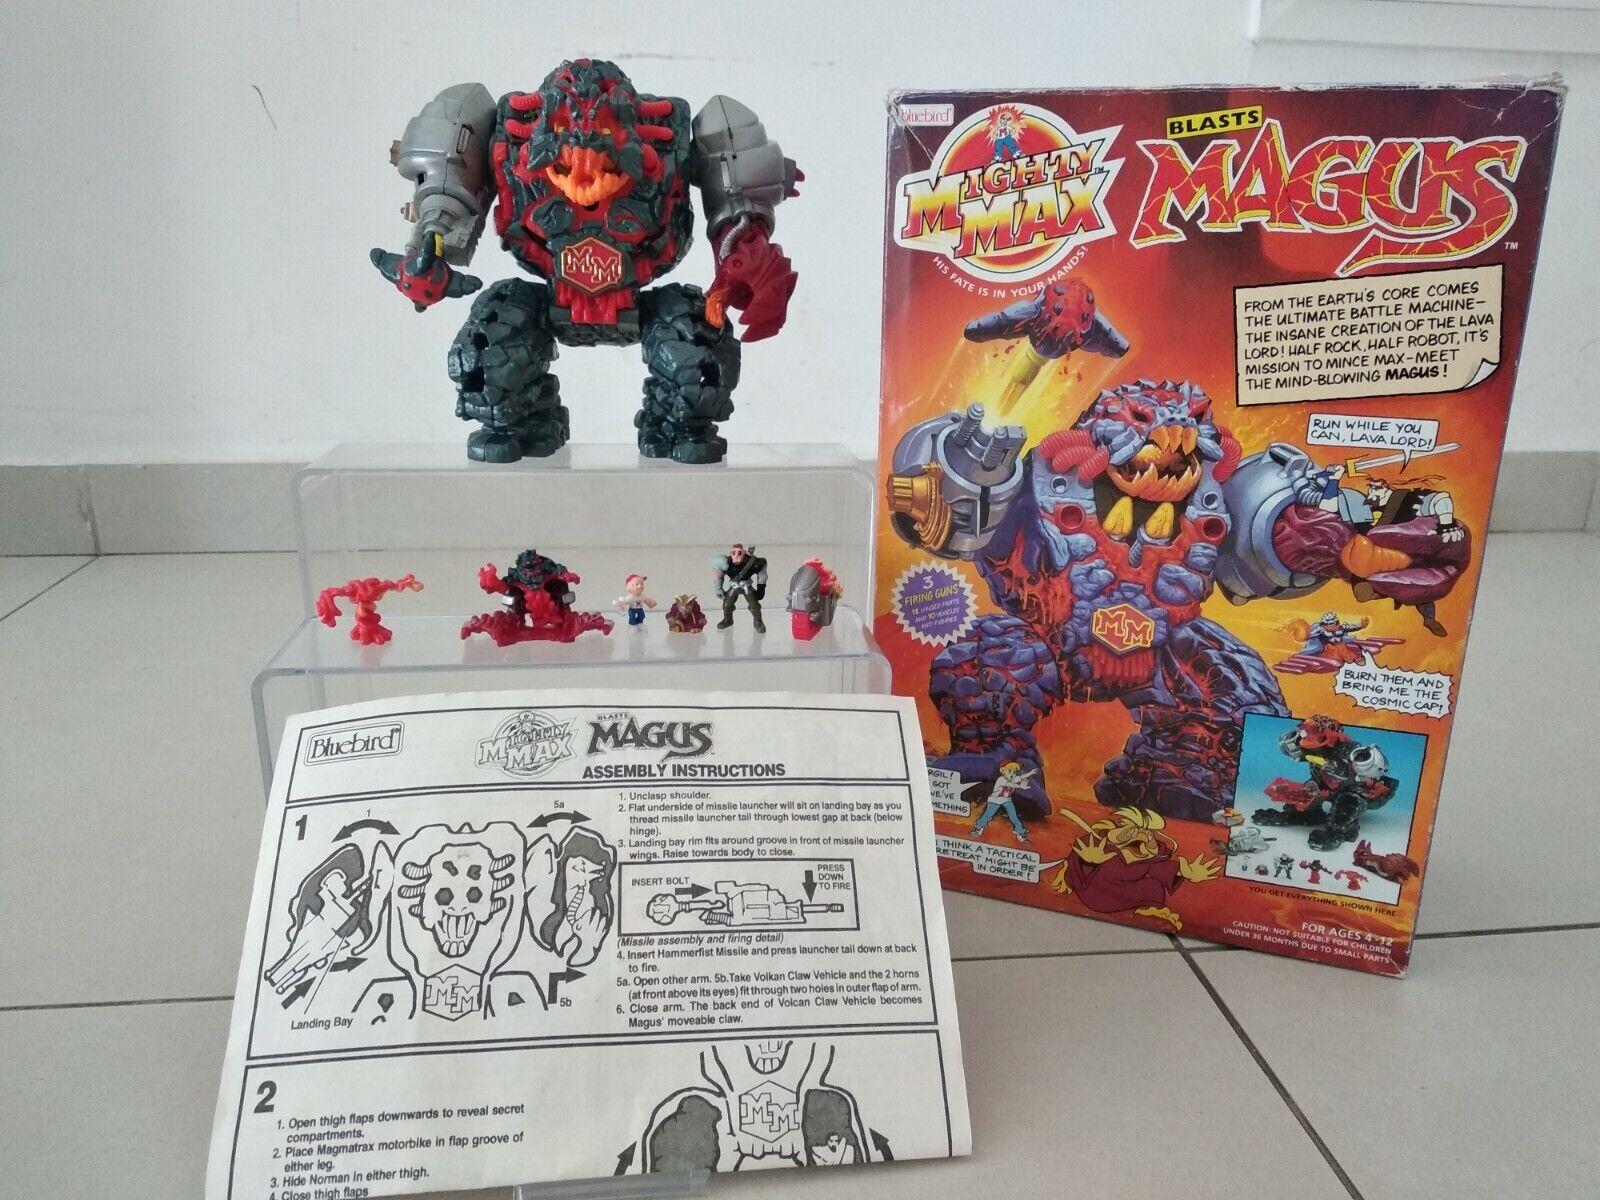 Mighty Max Blasts Magus Blaubird 1993 Vintage Boxed Toy Kids Retro Collectible